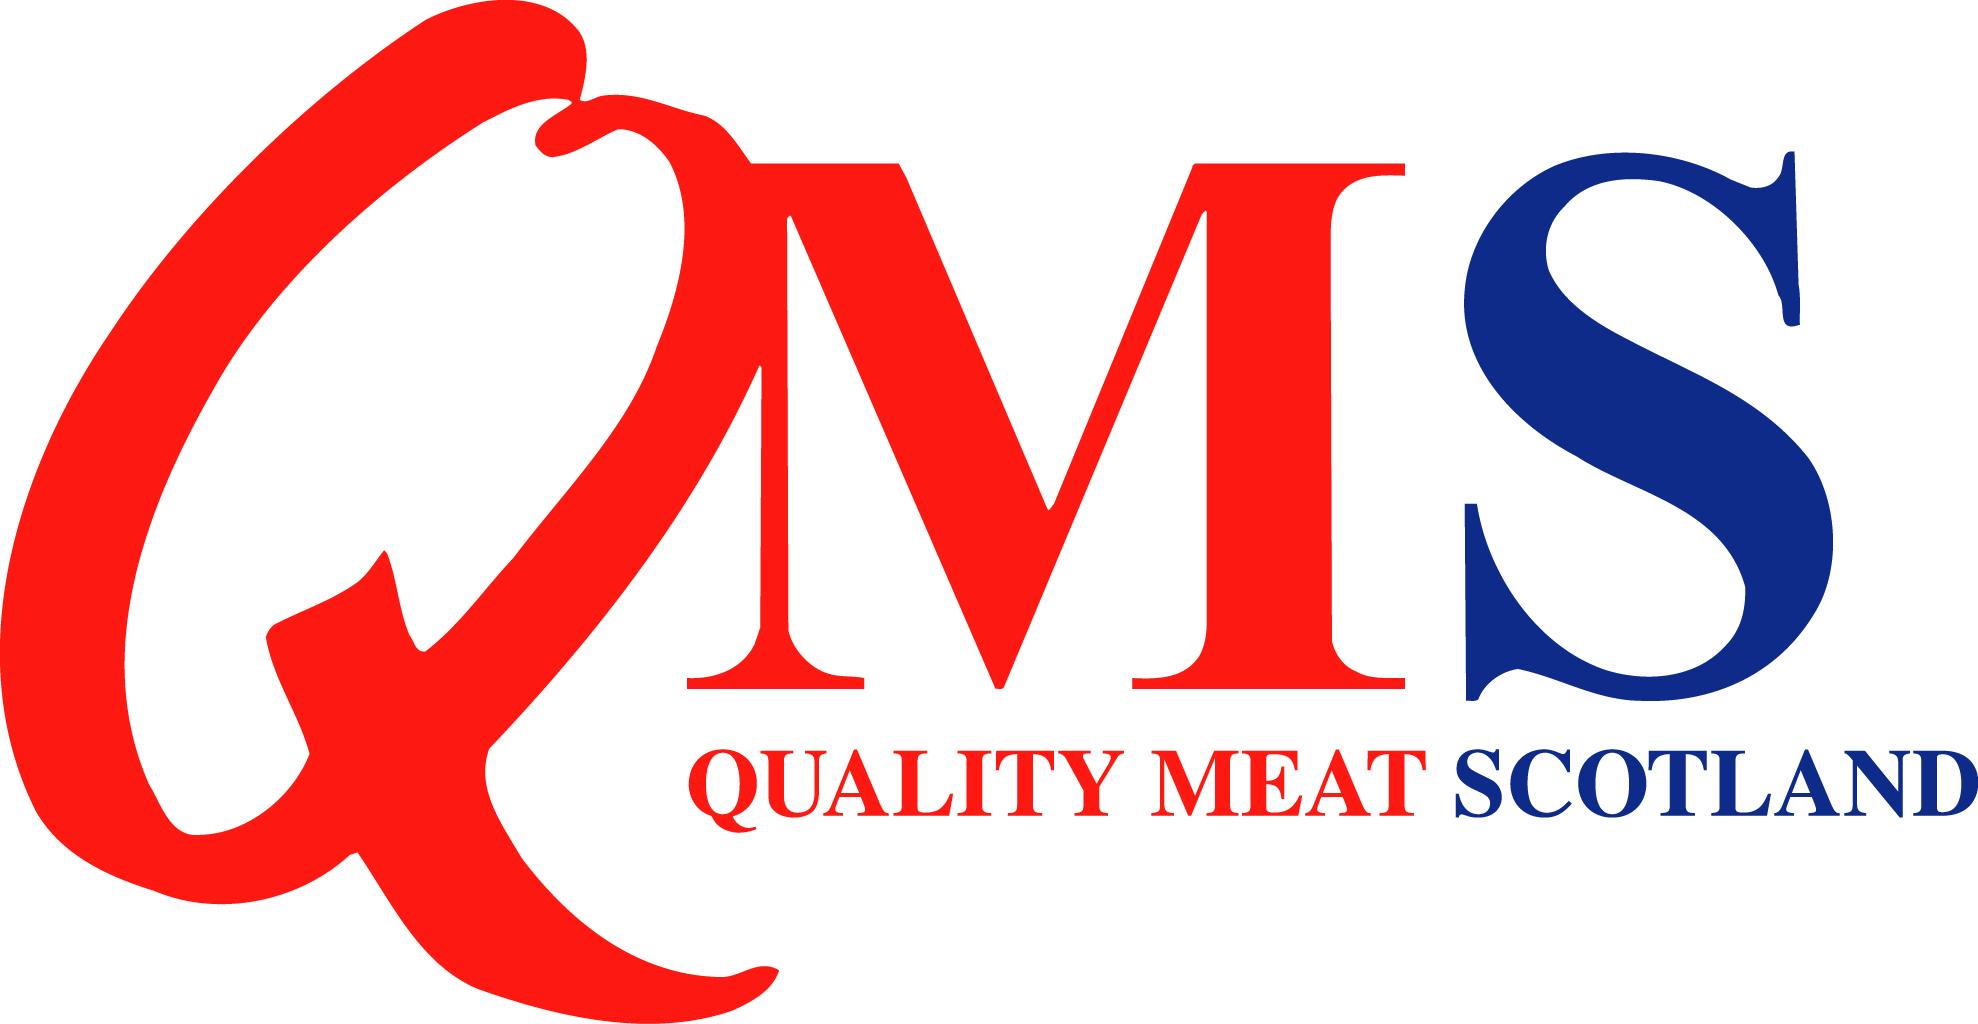 Quality Meat Scotland